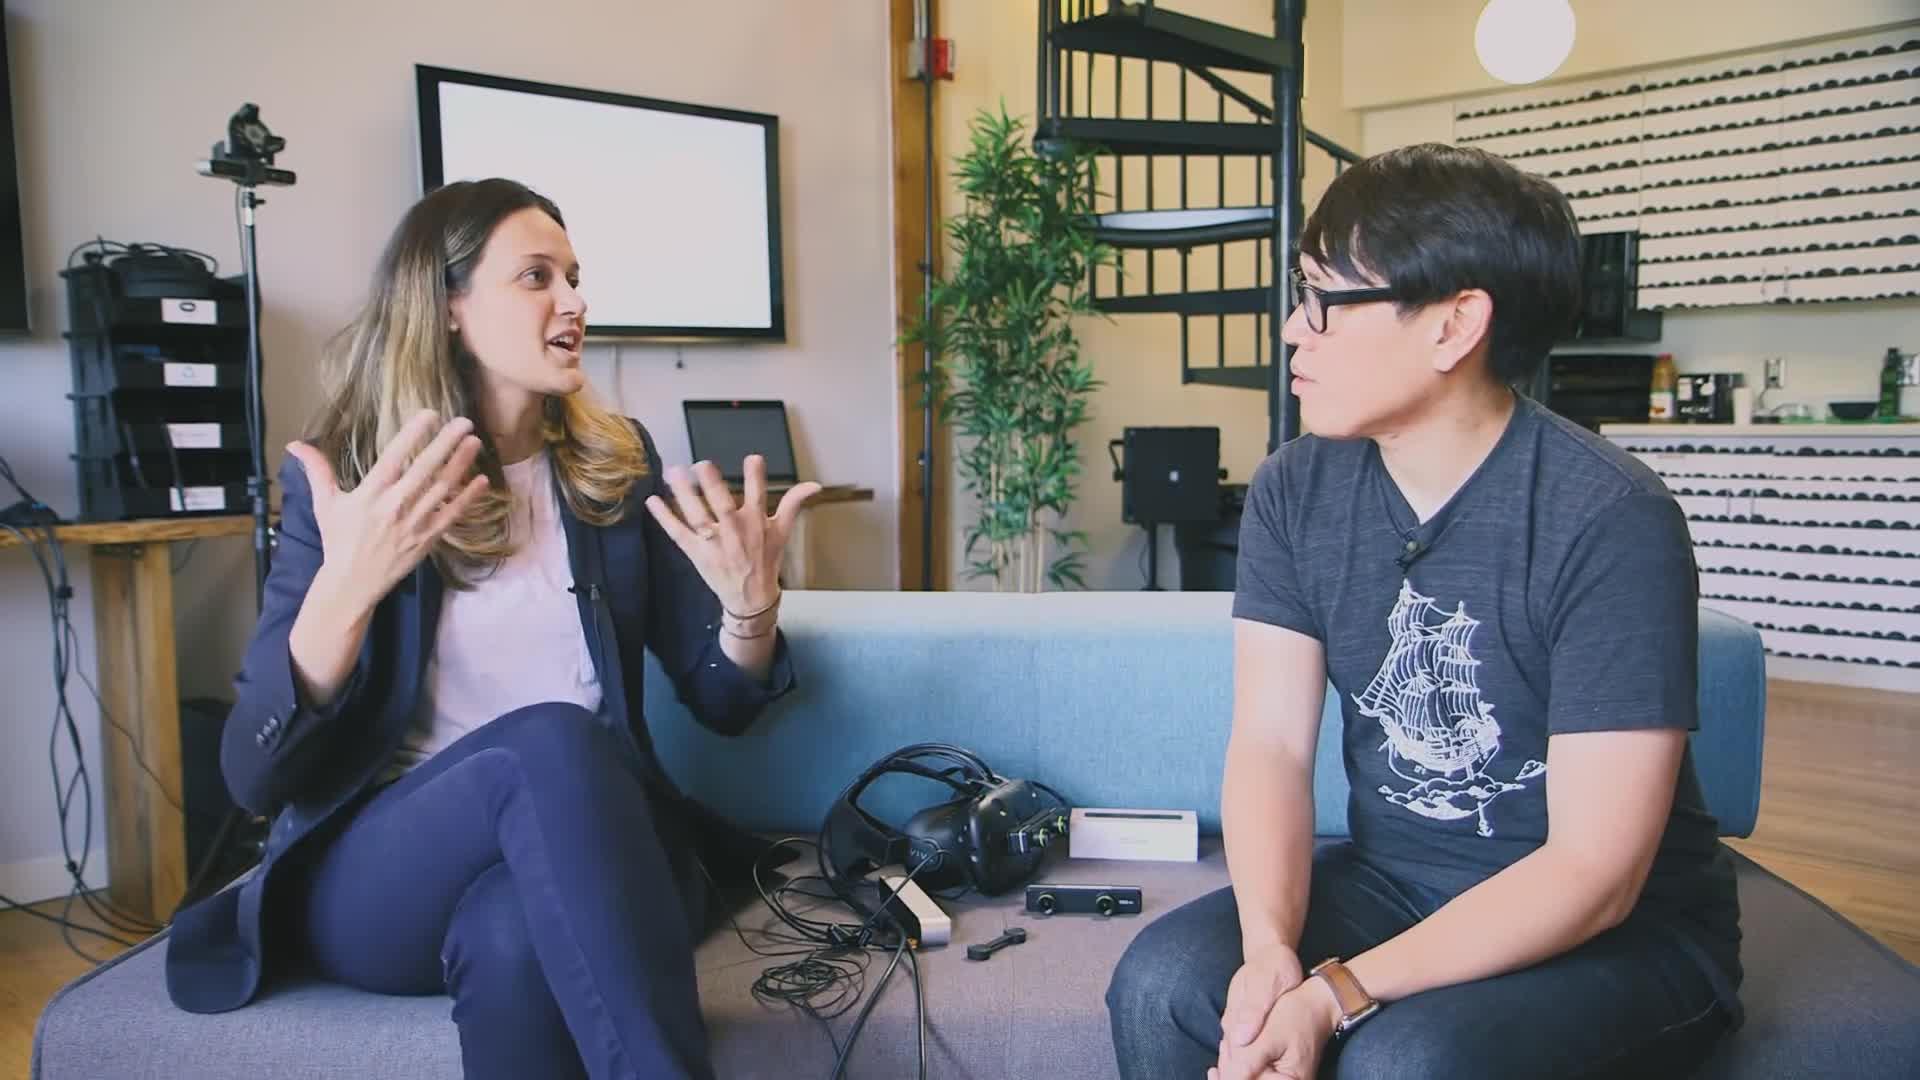 ZED Mini, ladiesinsuits, tested, testedcom, virtual reality, Cecile Schmollgruber talks the ZED Mini Mixed-Reality Camera! GIFs